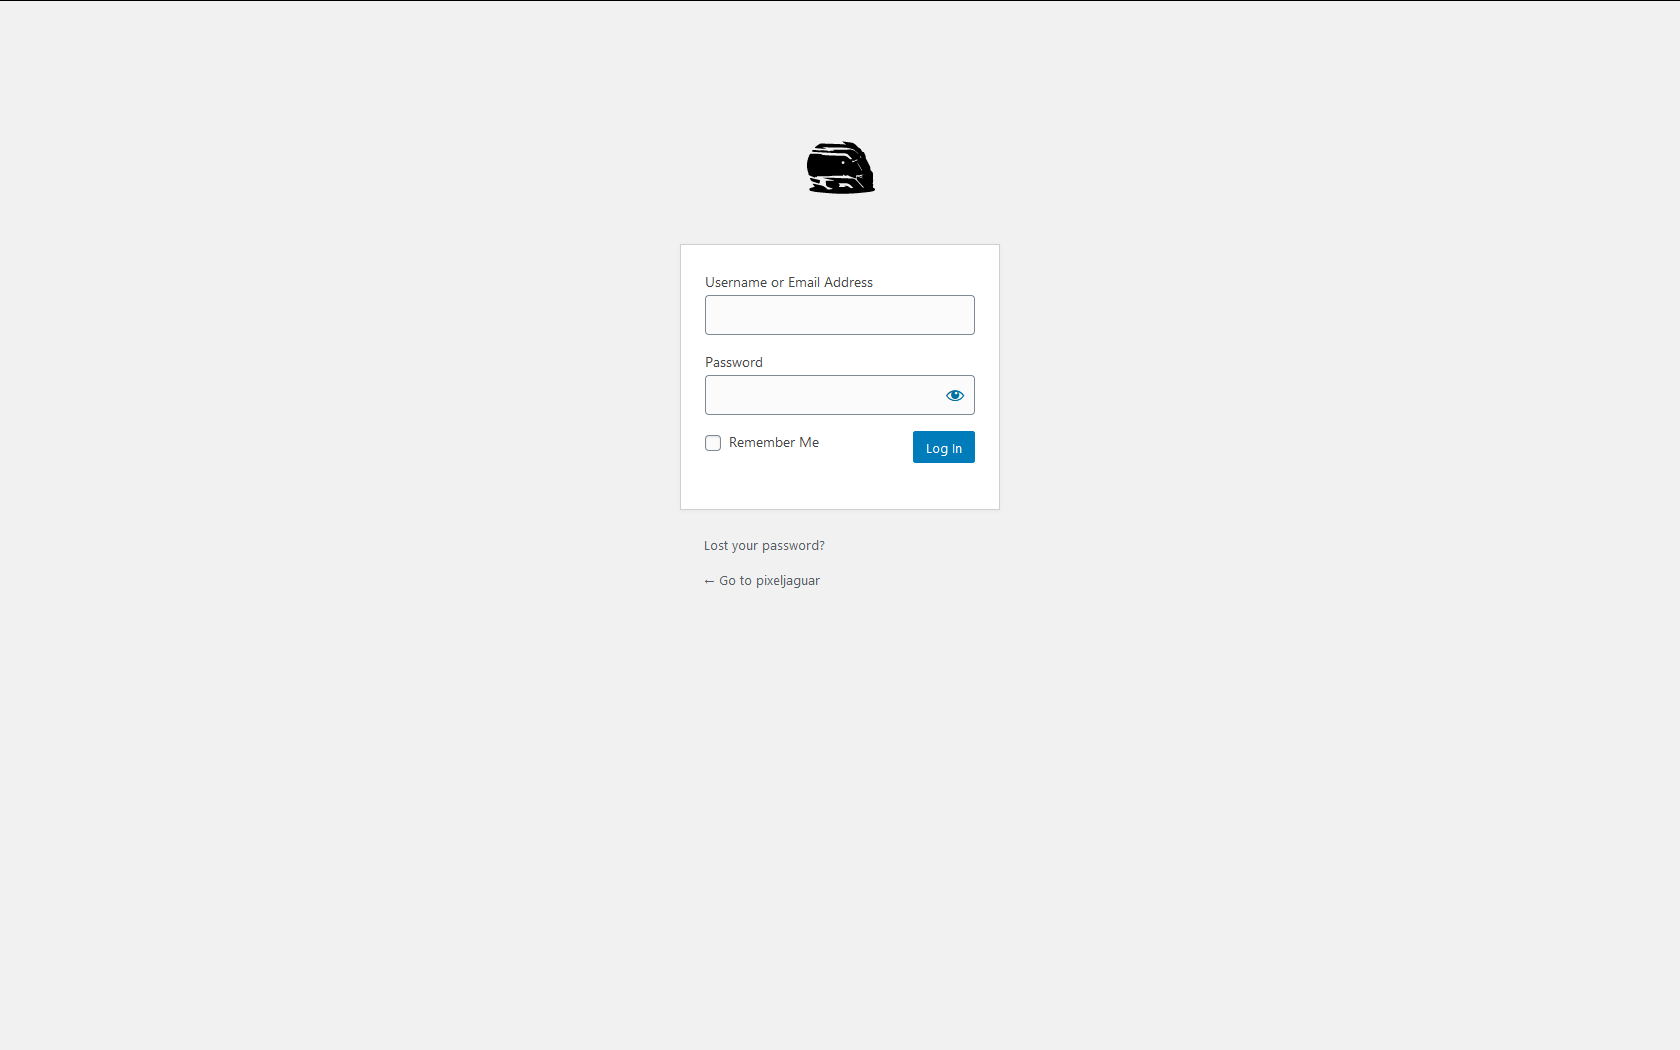 wordpress-custom-login-page-2021-preview-style-by-pixeljaguar-studio